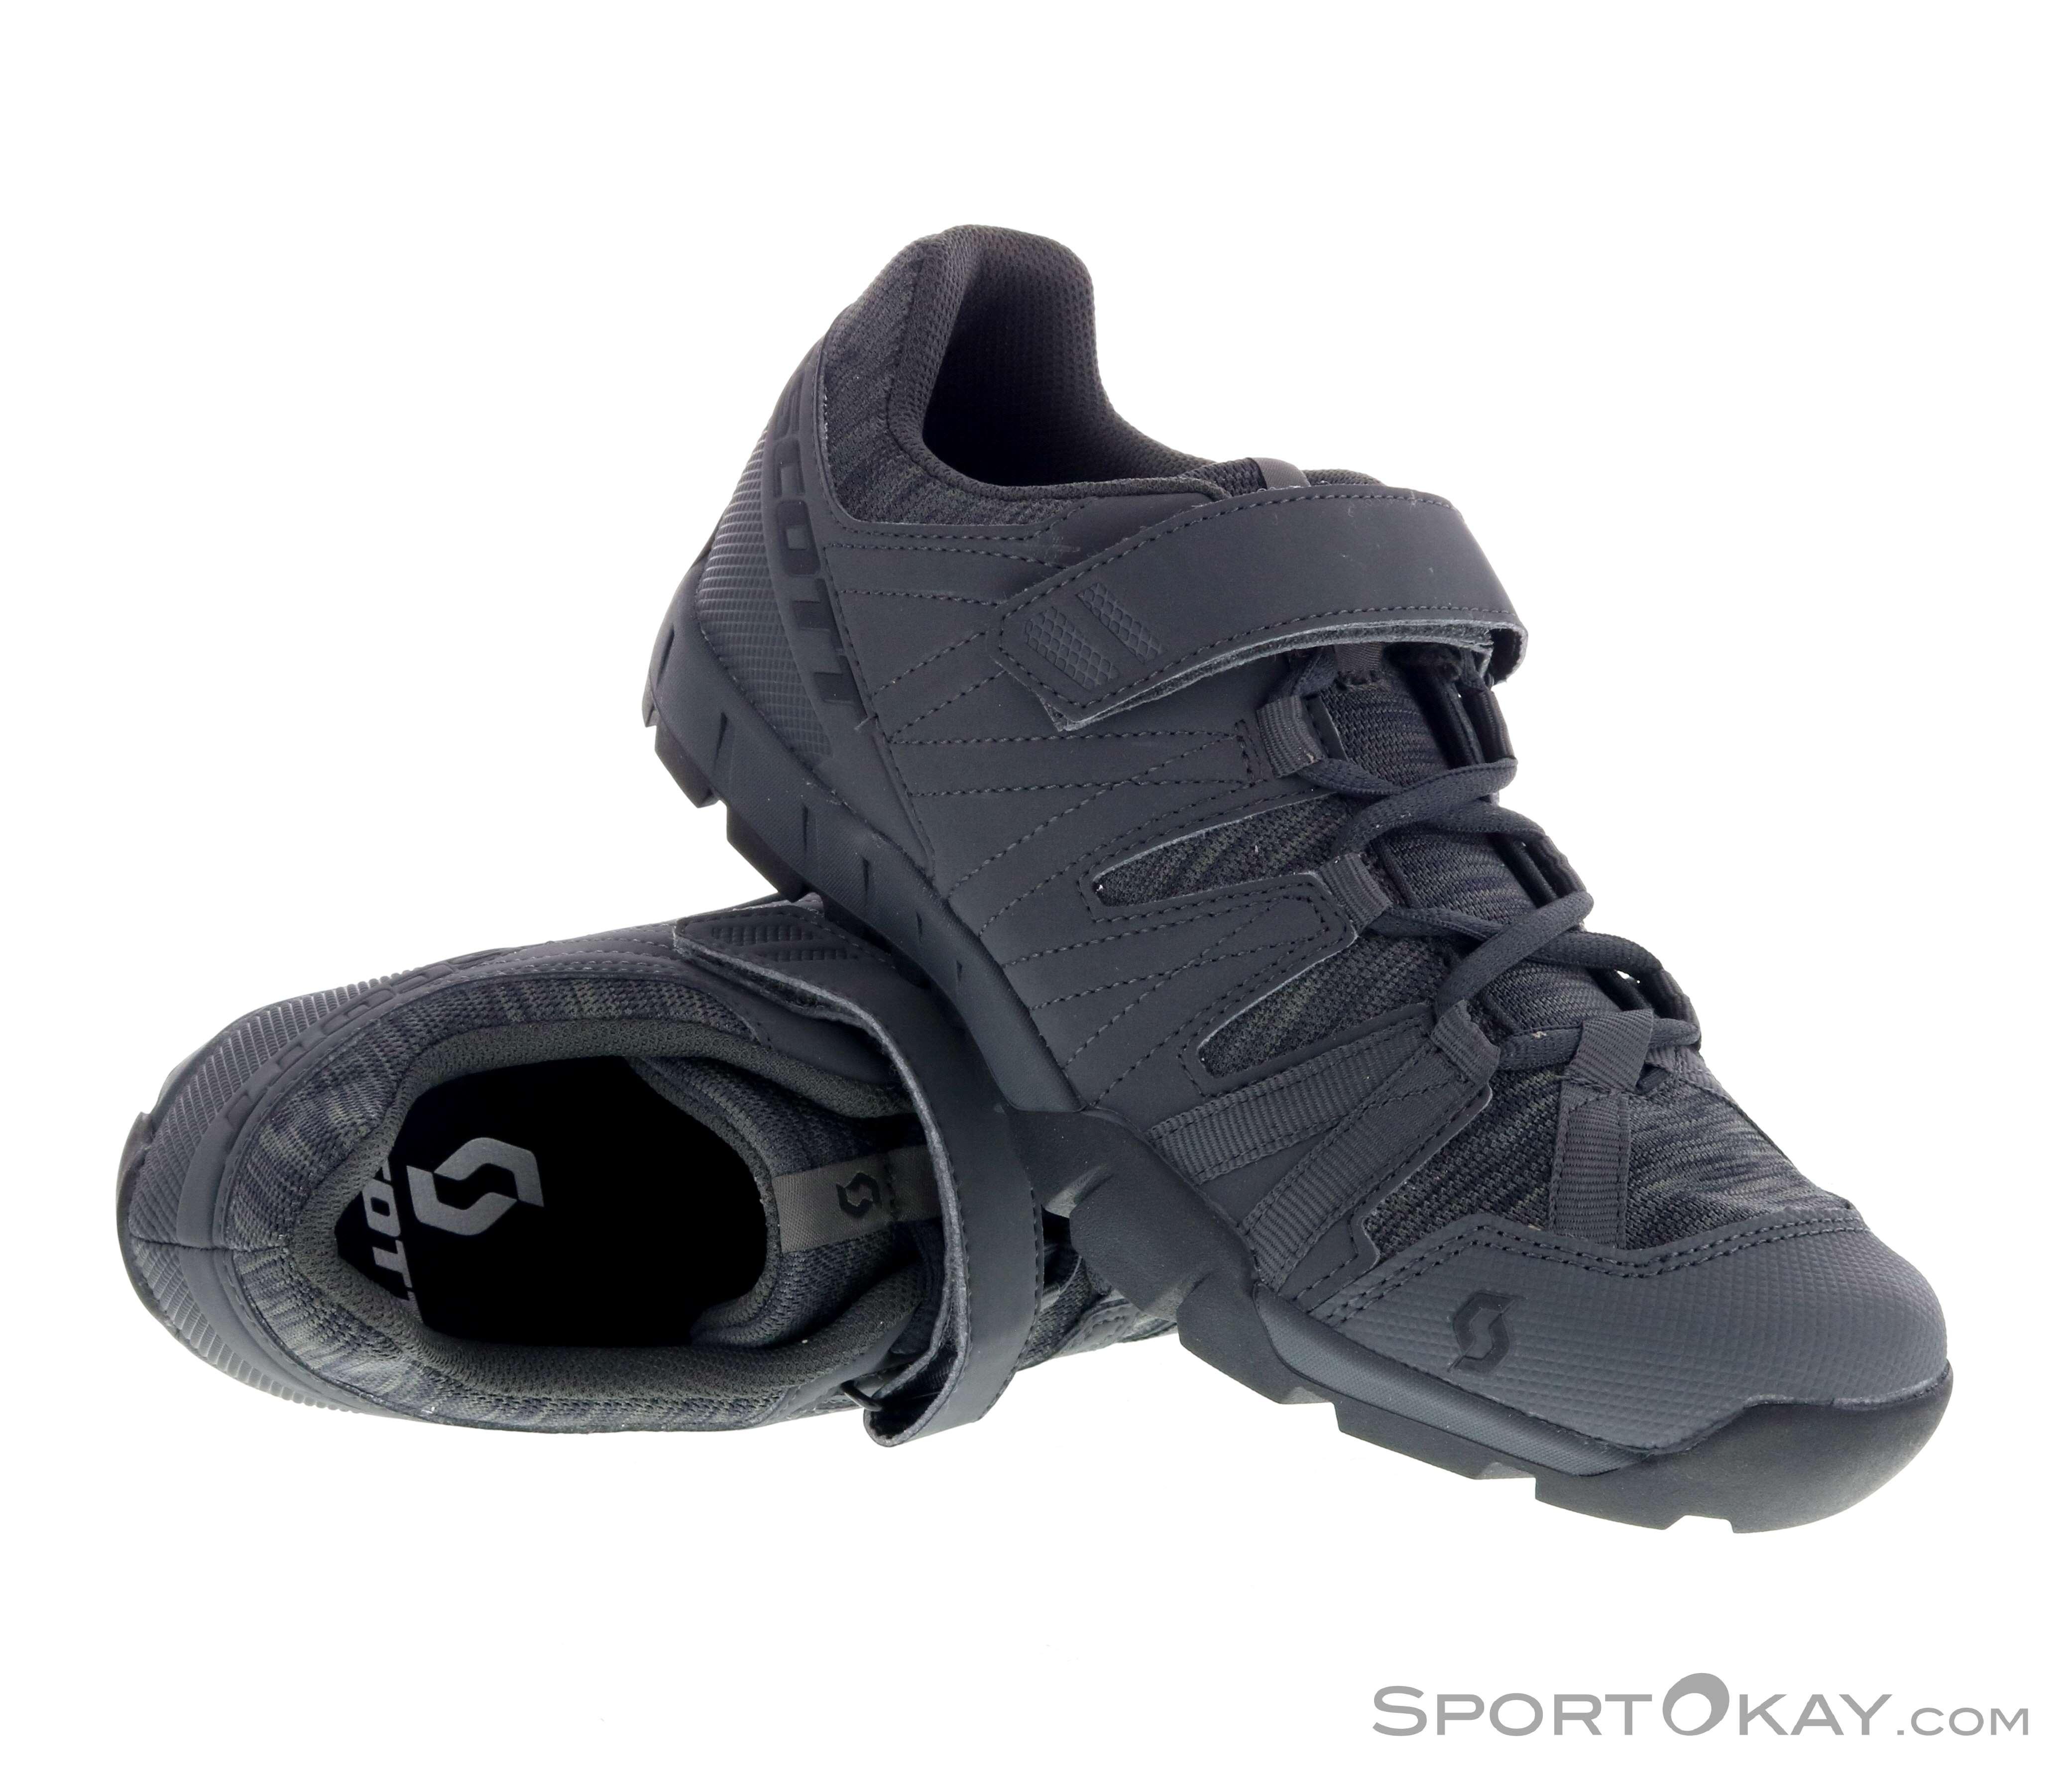 Scott Trail Shoe Mens Biking Shoes